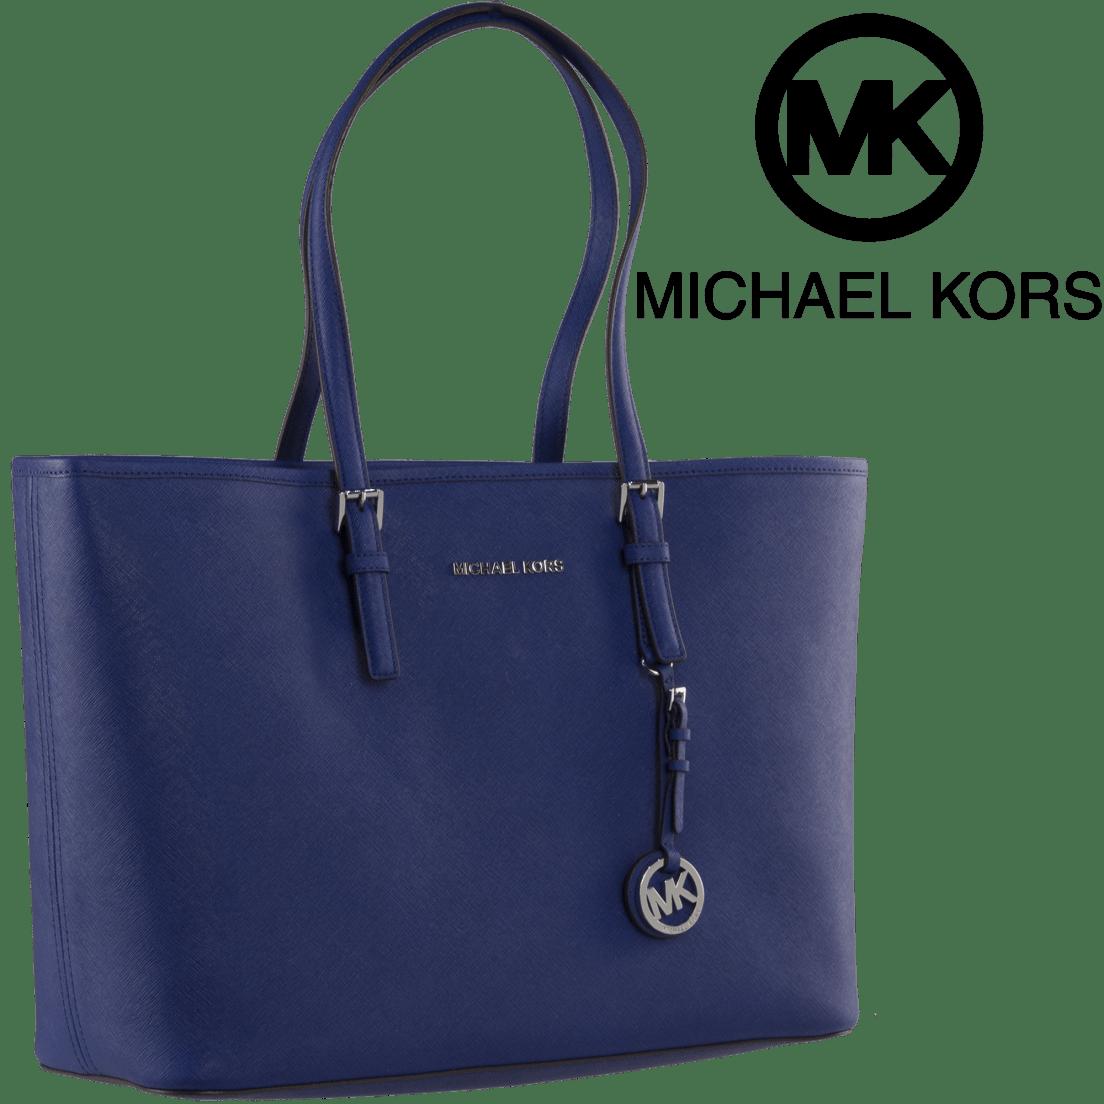 Top Michael Medium In Tote Jet Blue Leather Kors Saffiano Set Travel Zip iTPZkXuO